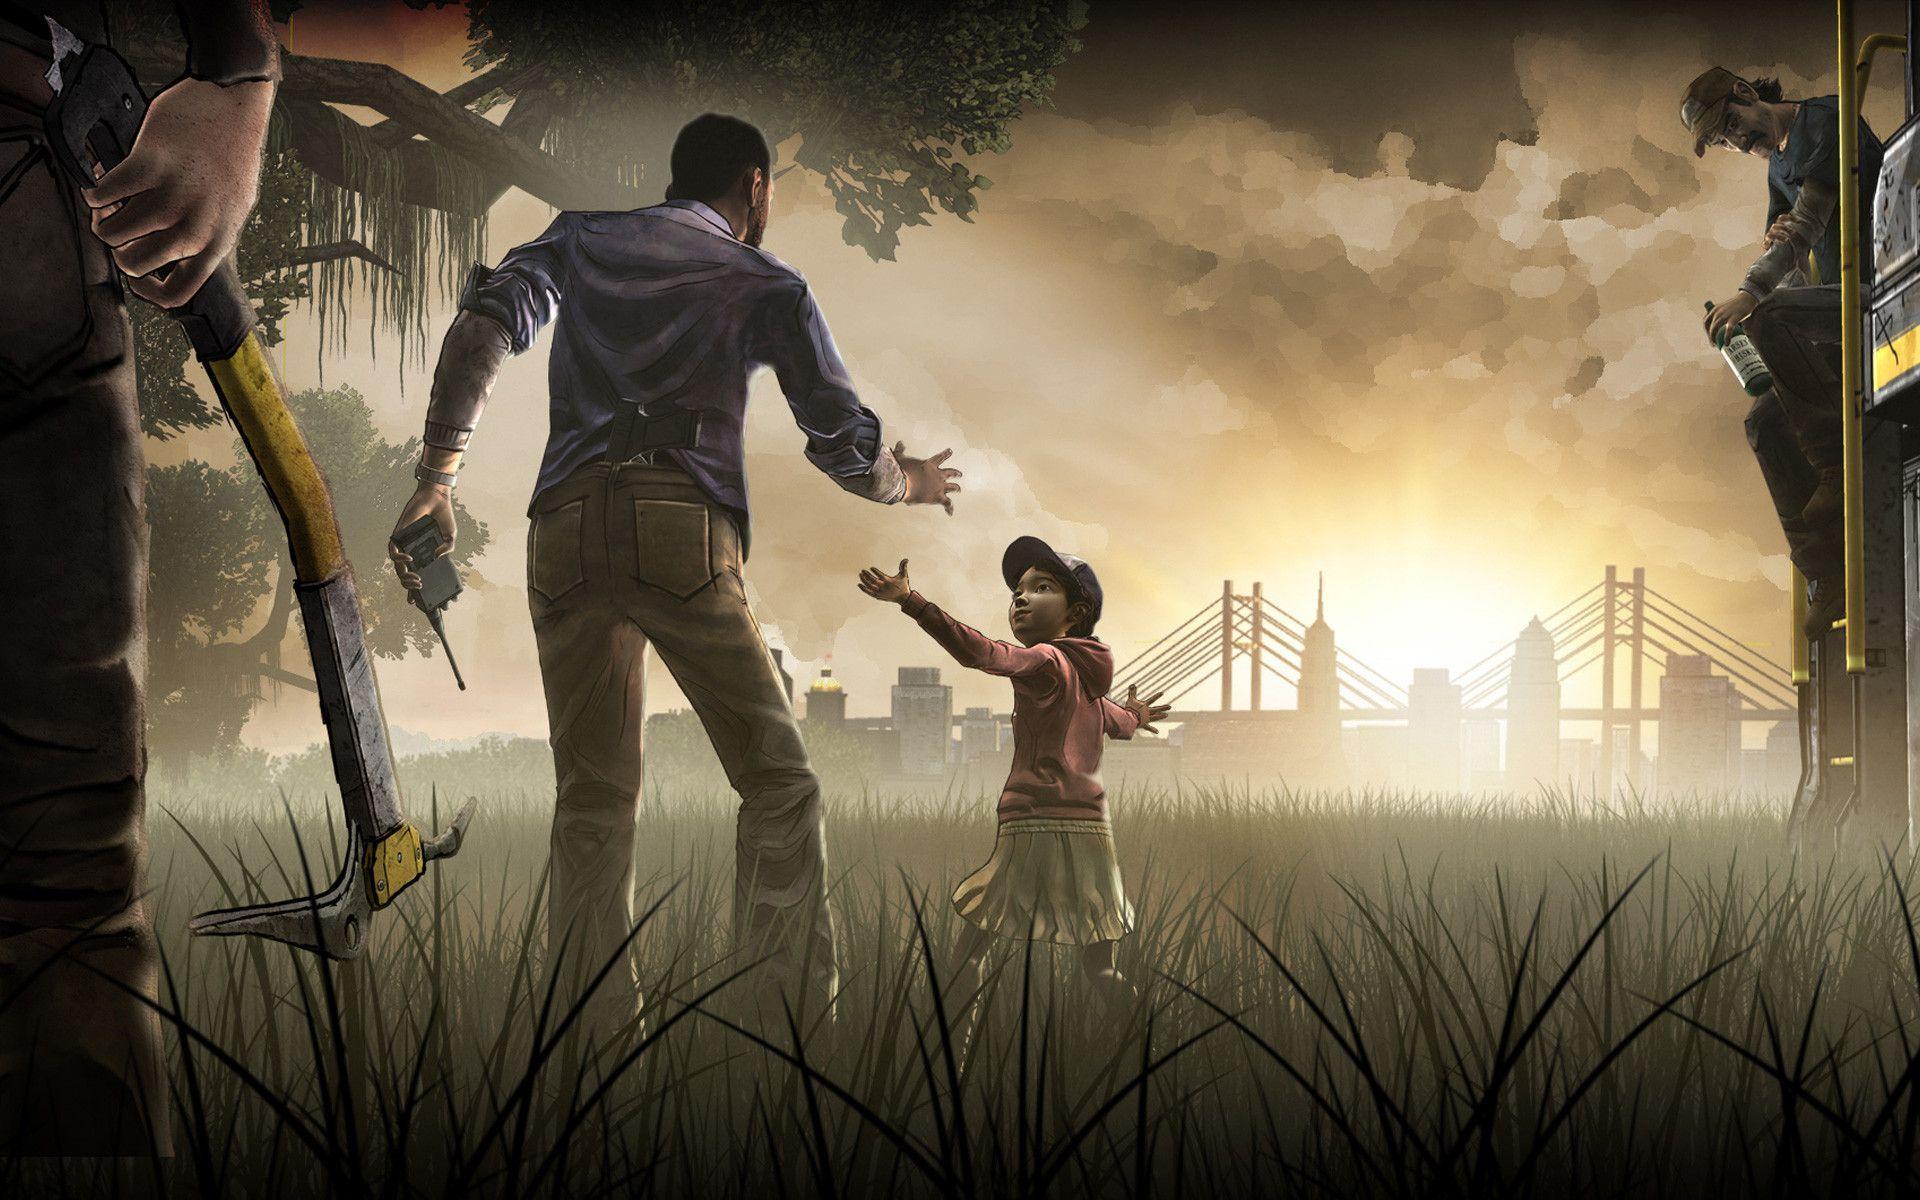 74 The Walking Dead Game Wallpaper On Wallpapersafari